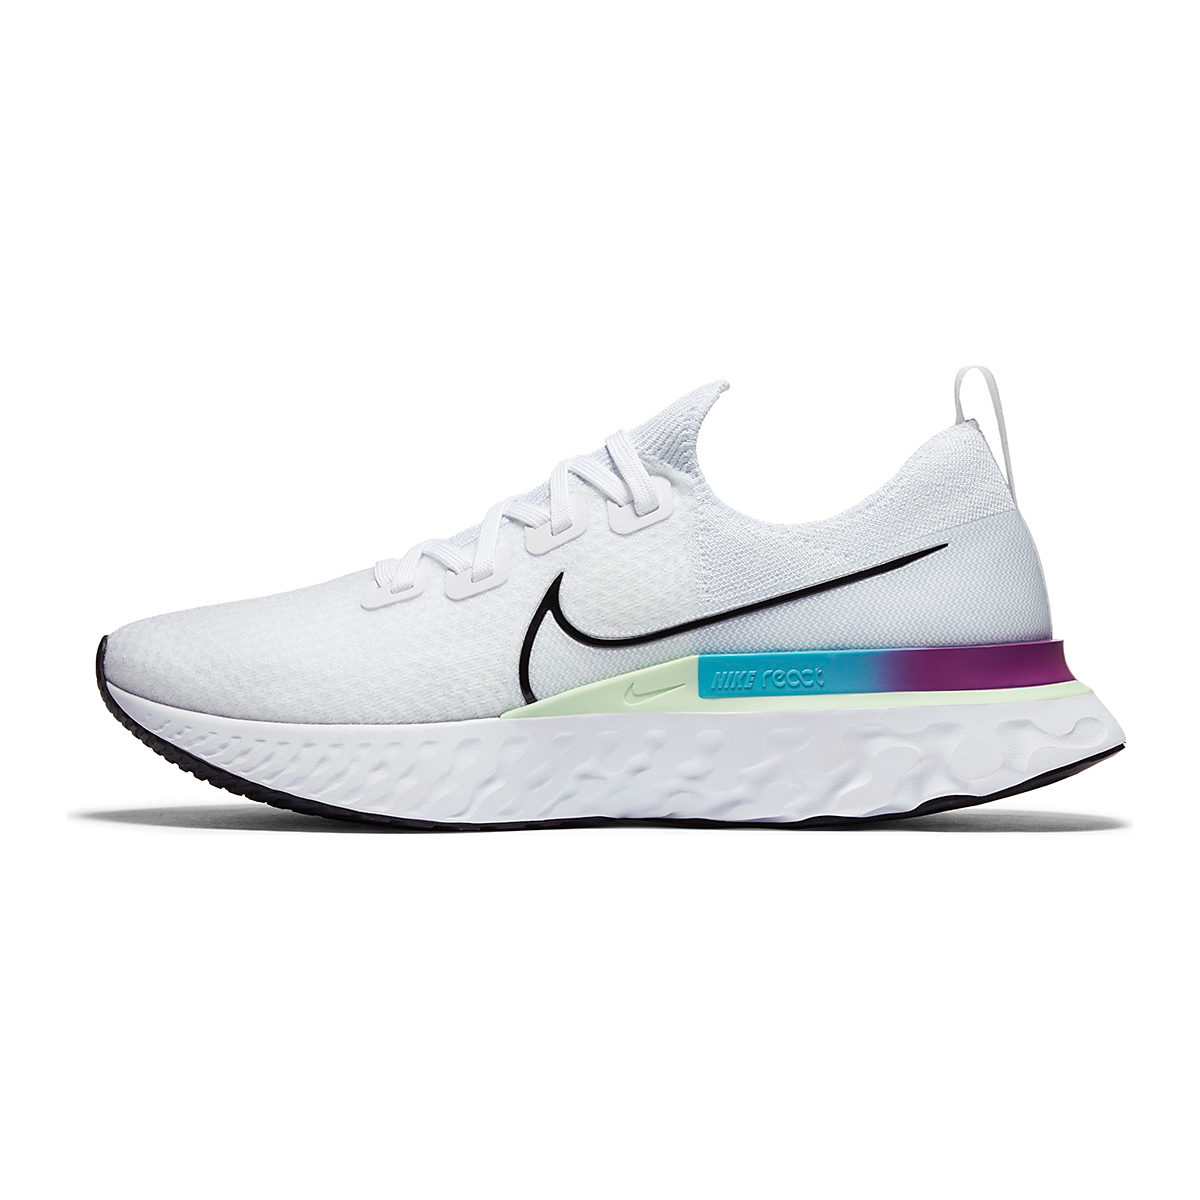 Men's Nike React Infinity Run Flyknit Running Shoes - Color: White/Vapor Green/Oracle Aqua/Black - Size: 6 - Width: Regular, White/Vapor Green/Oracle Aqua/Black, large, image 3